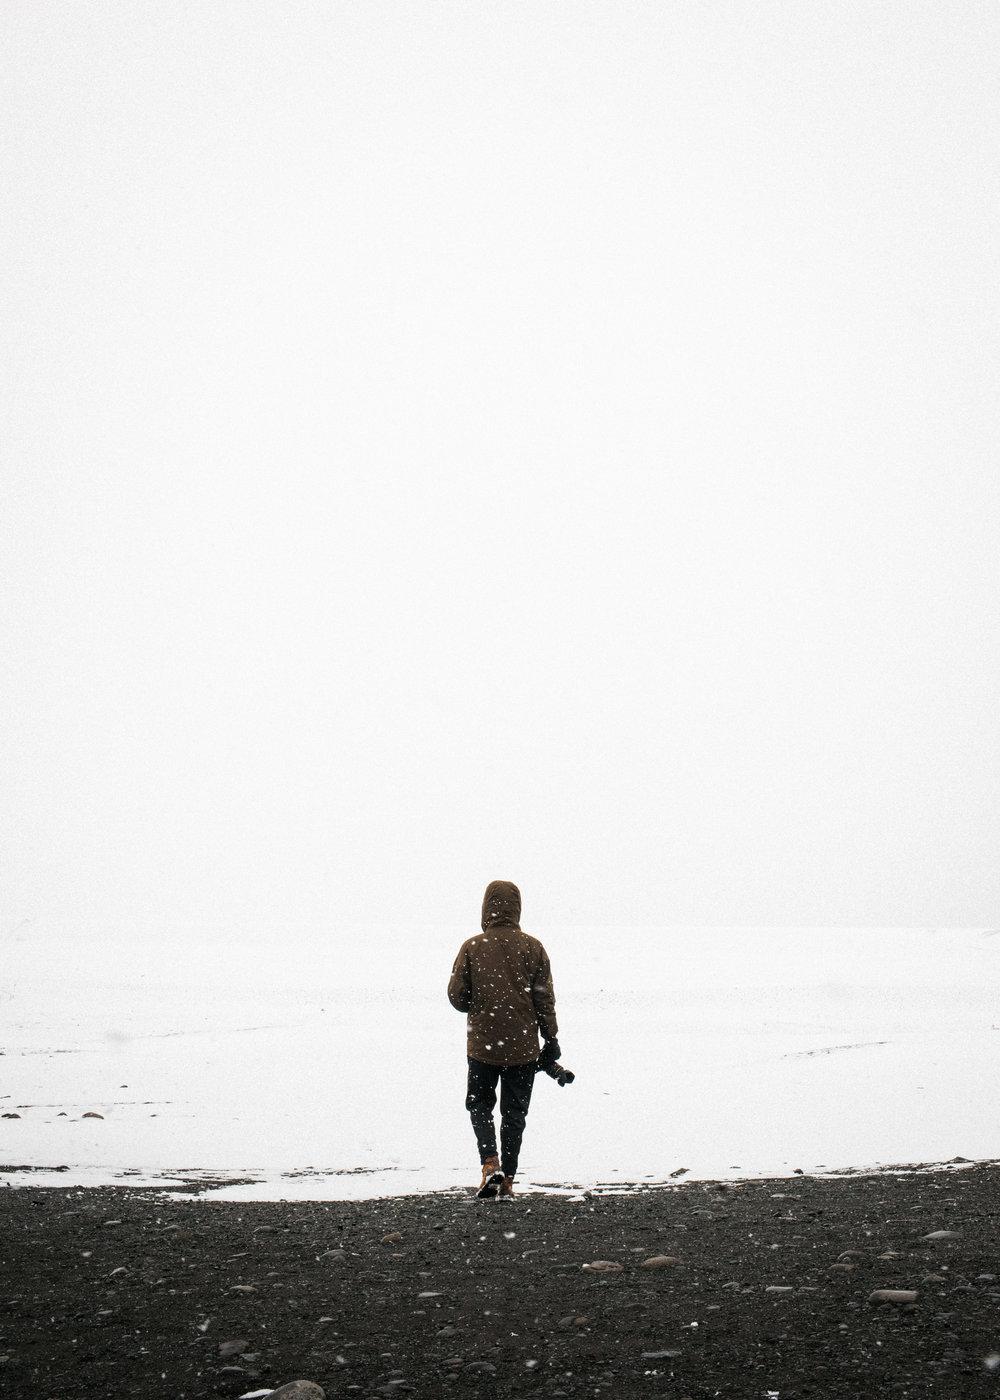 ICELAND_WOMAN_PHOTOGRAPHER_TARASHUPE_OUTDOOR_PHOTOGRAPHY_097.jpg